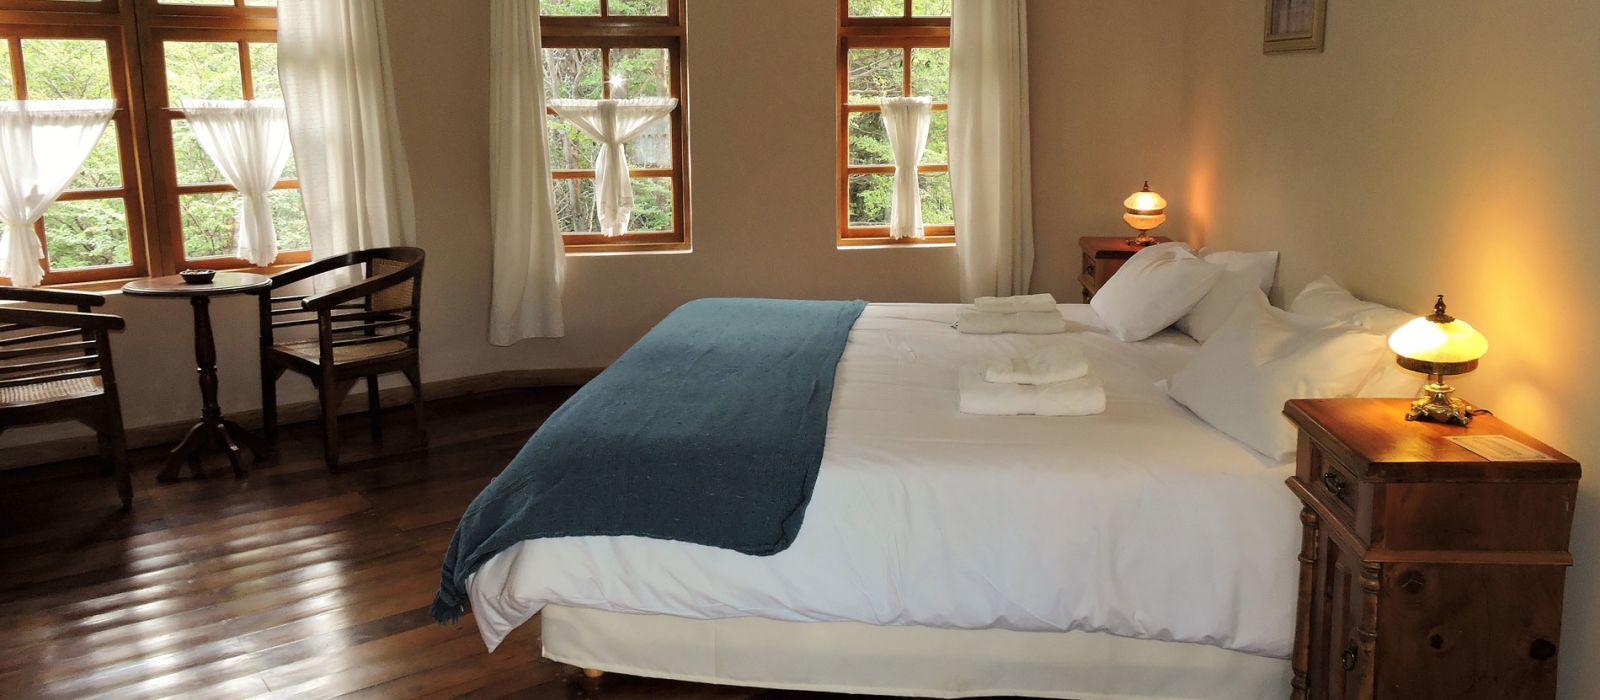 Hotel Hosteria El Pilar Argentinien